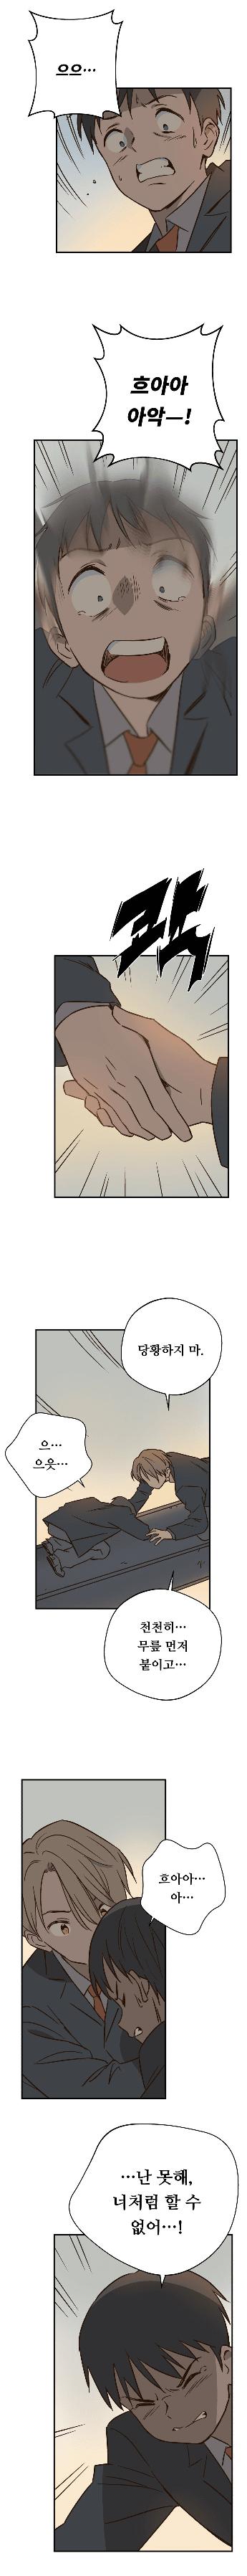 viewimage.php?no=24b0d769e1d32ca73feb87fa11d0283175f95a5bb5a9434fdc24c2adb2484bdacd6c45863d45a4077a7a9813fff2926198cfdf5523be7bb0f571ce19e417b7b25f8d67bdaa08e68354f84074